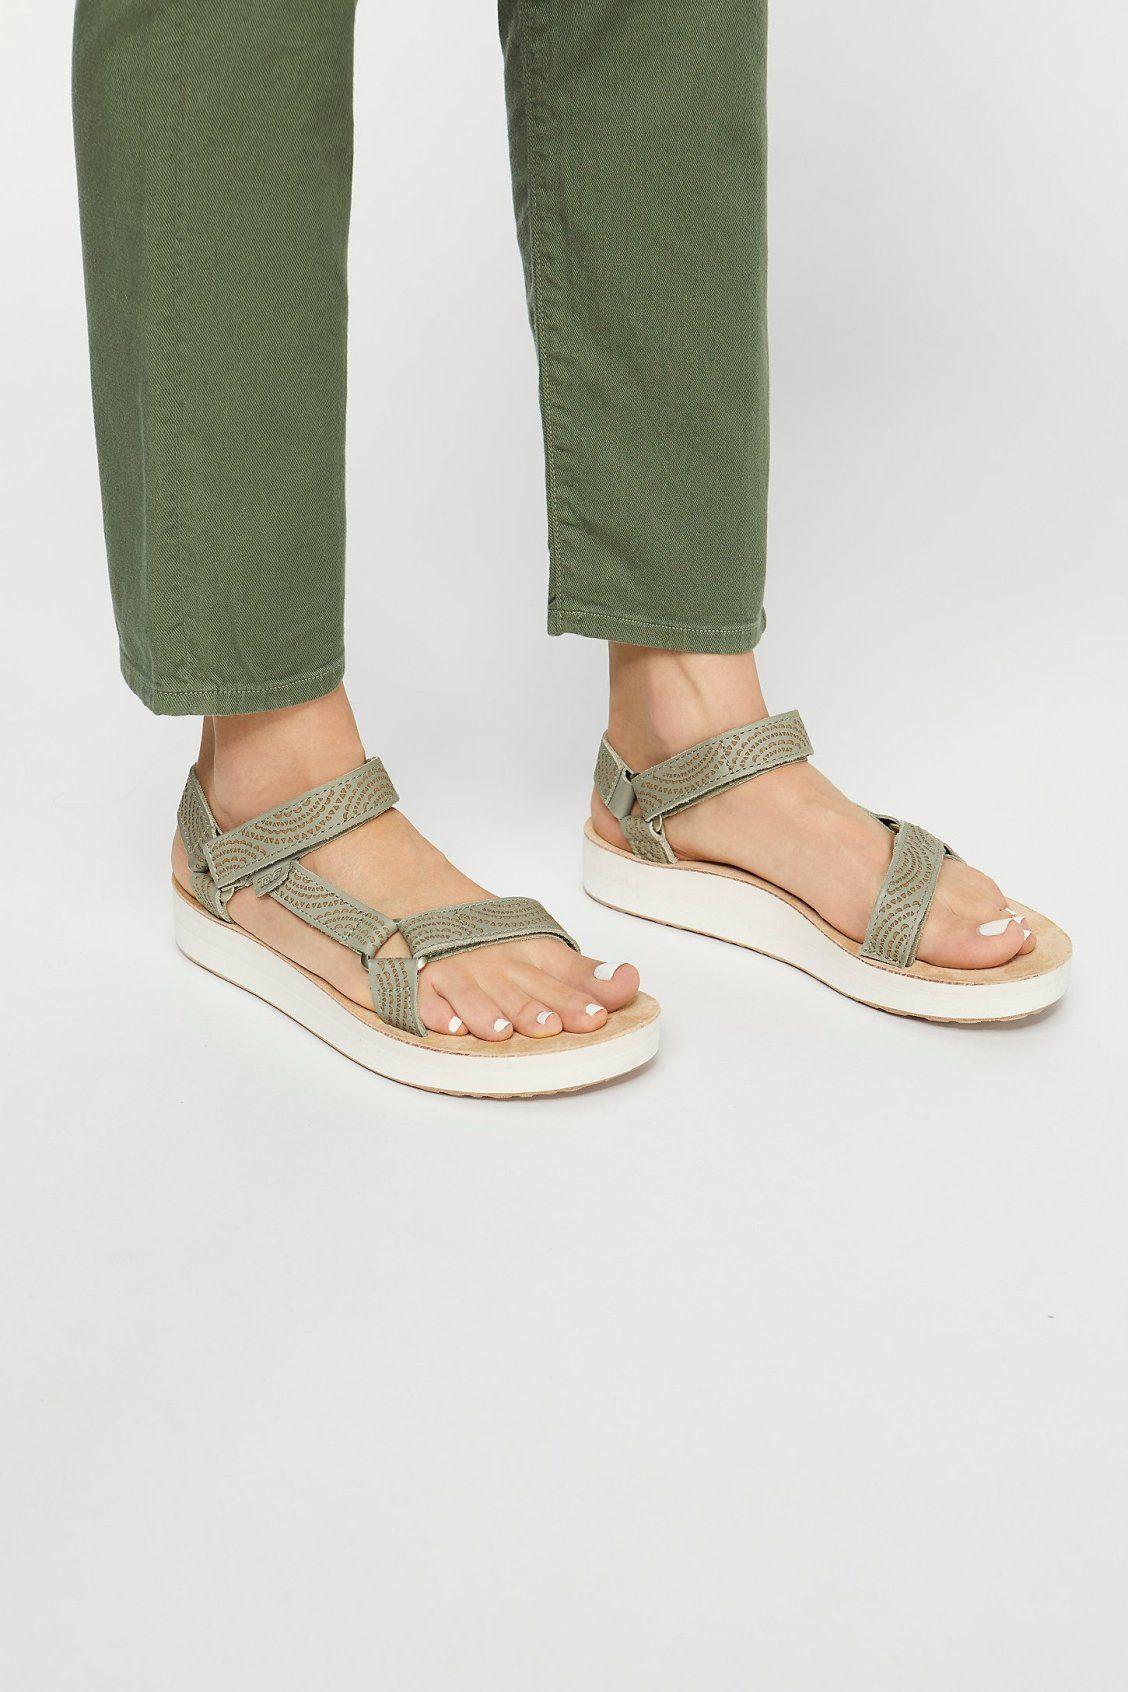 fa4544a7 Midform Universal Geometric Teva Sandal | Shoes | Shoes, Sandals ...